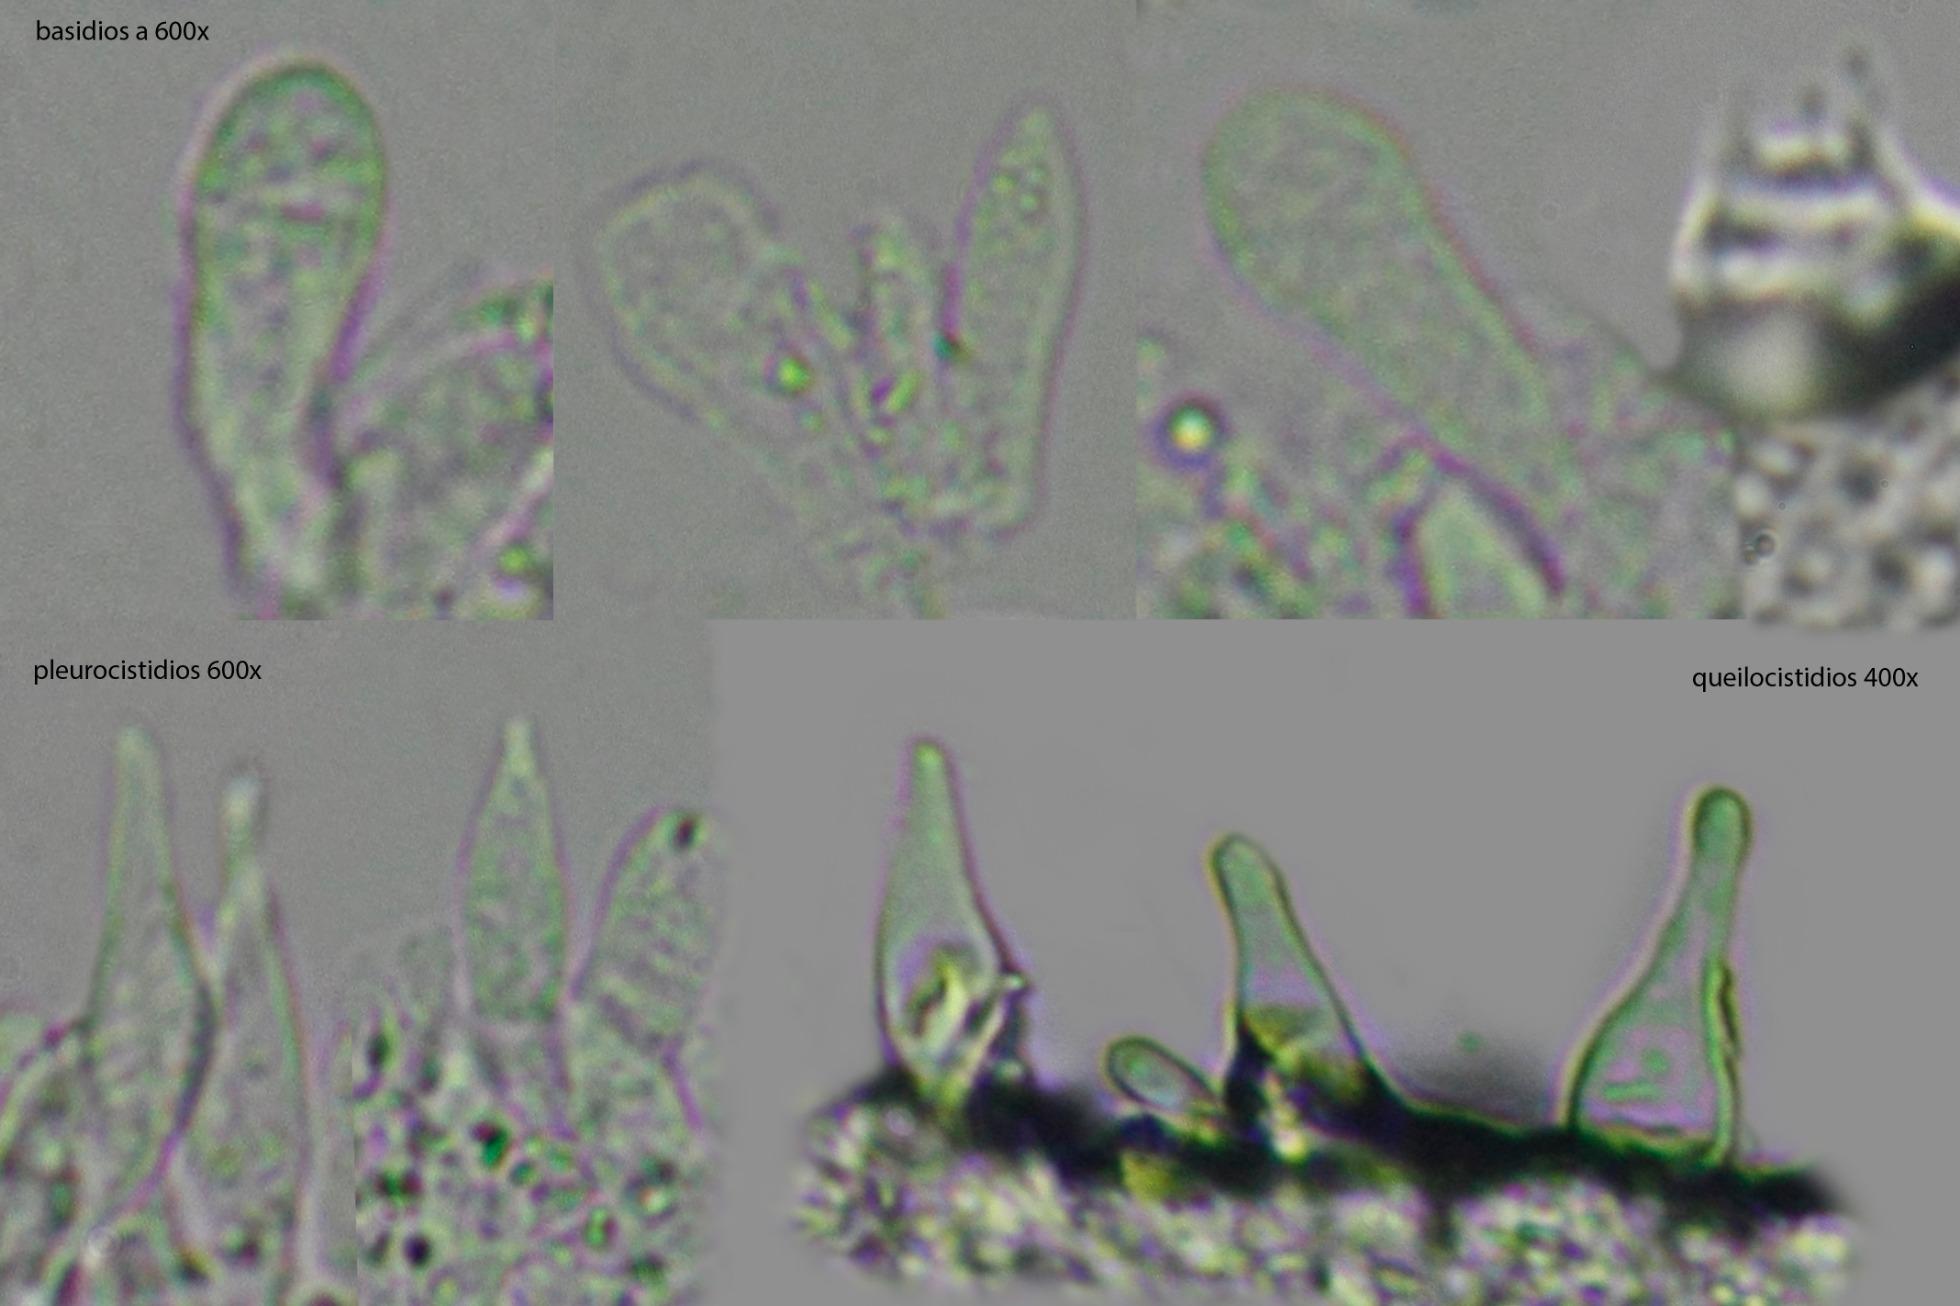 basidiosycistidios.jpg